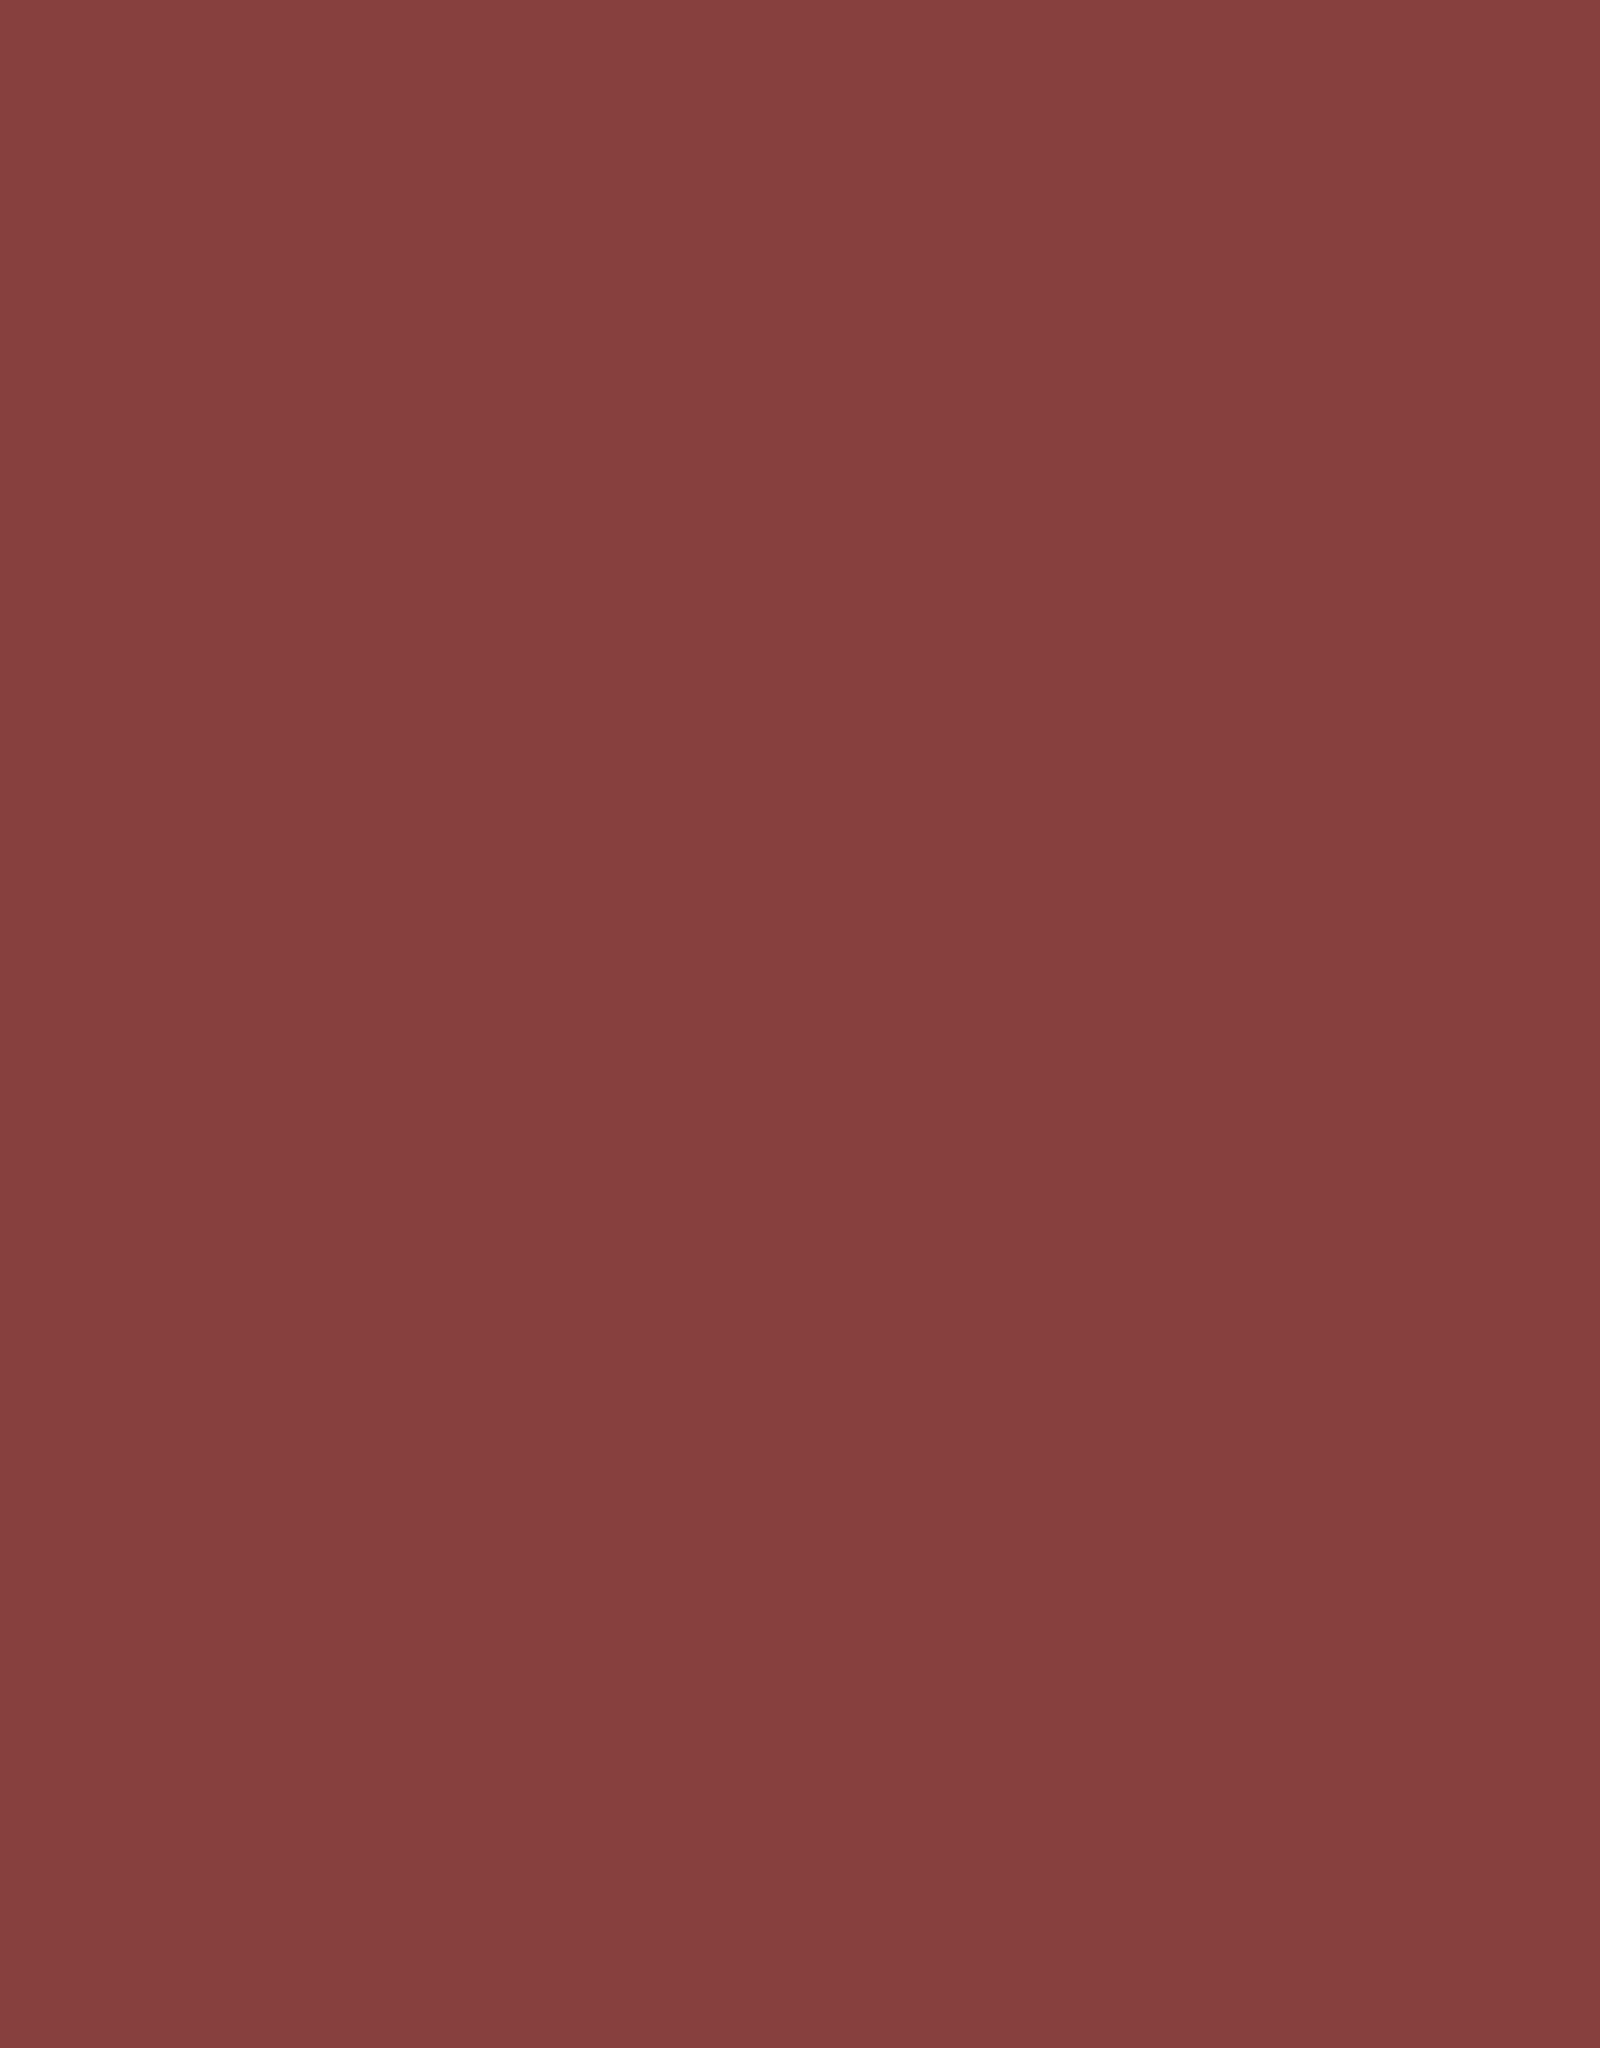 Sennelier, Extra Fine Soft Pastel, Vermilion Brown